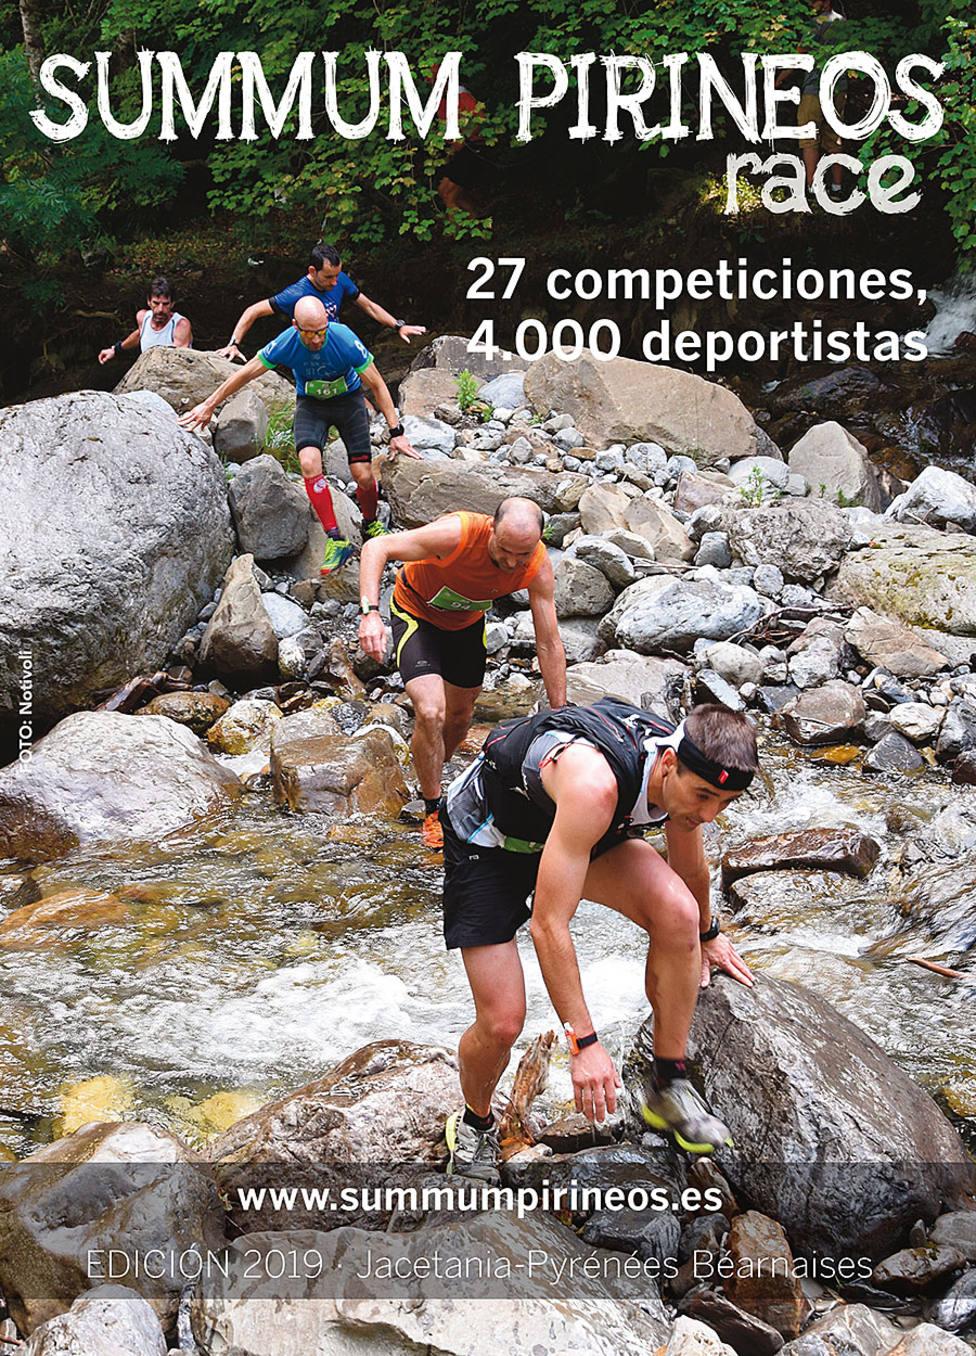 Summum Pirineos Race